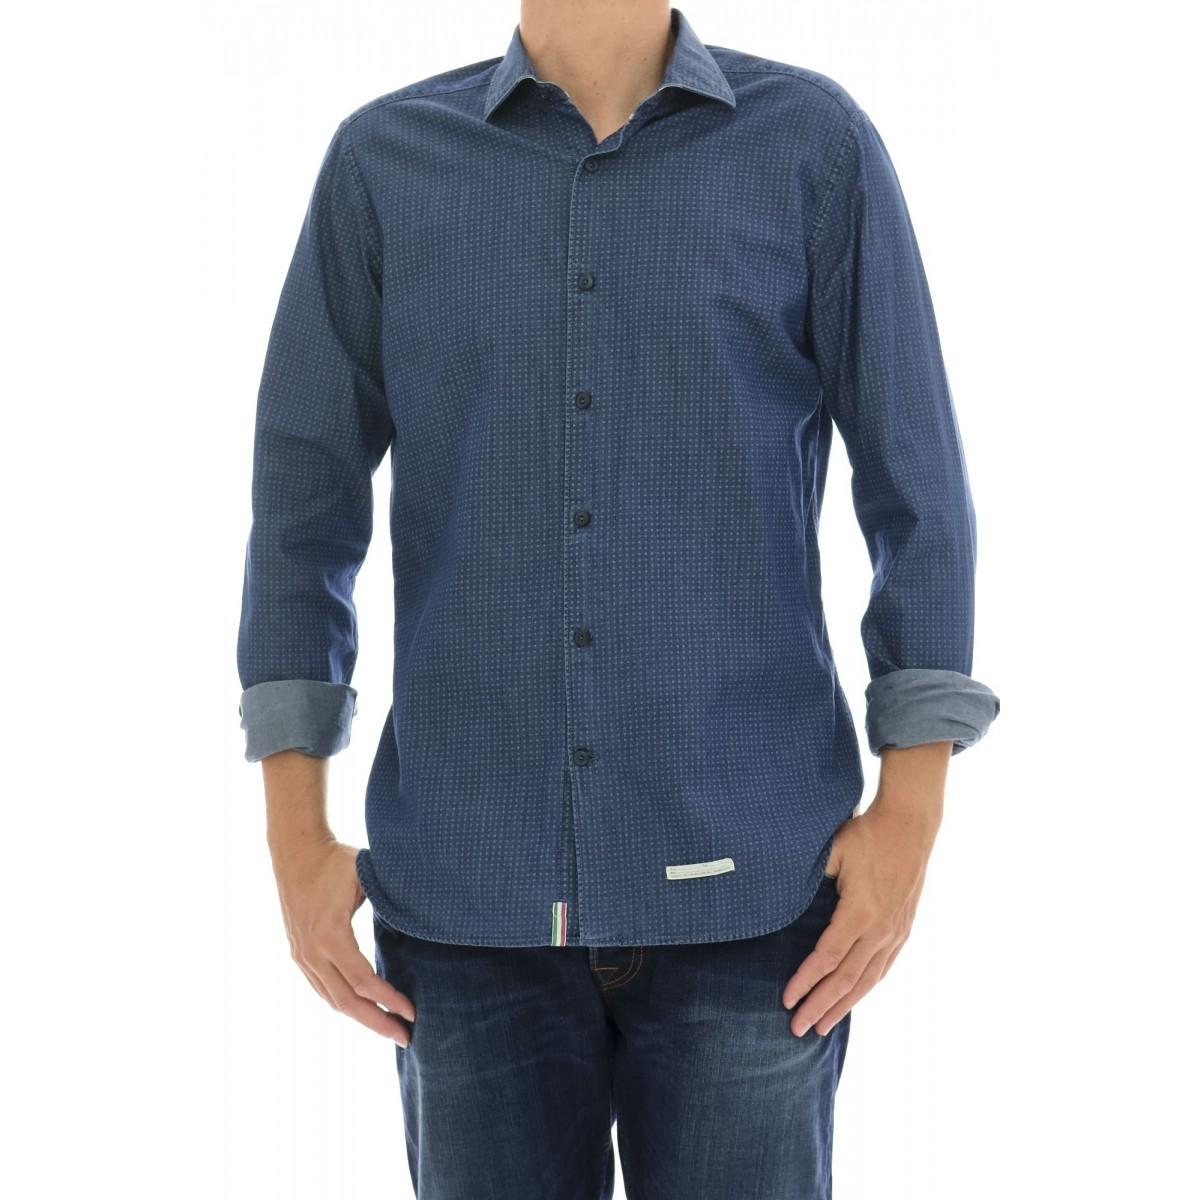 Camicia uomo Tintoria mattei 954 - Tvp nm2 denim